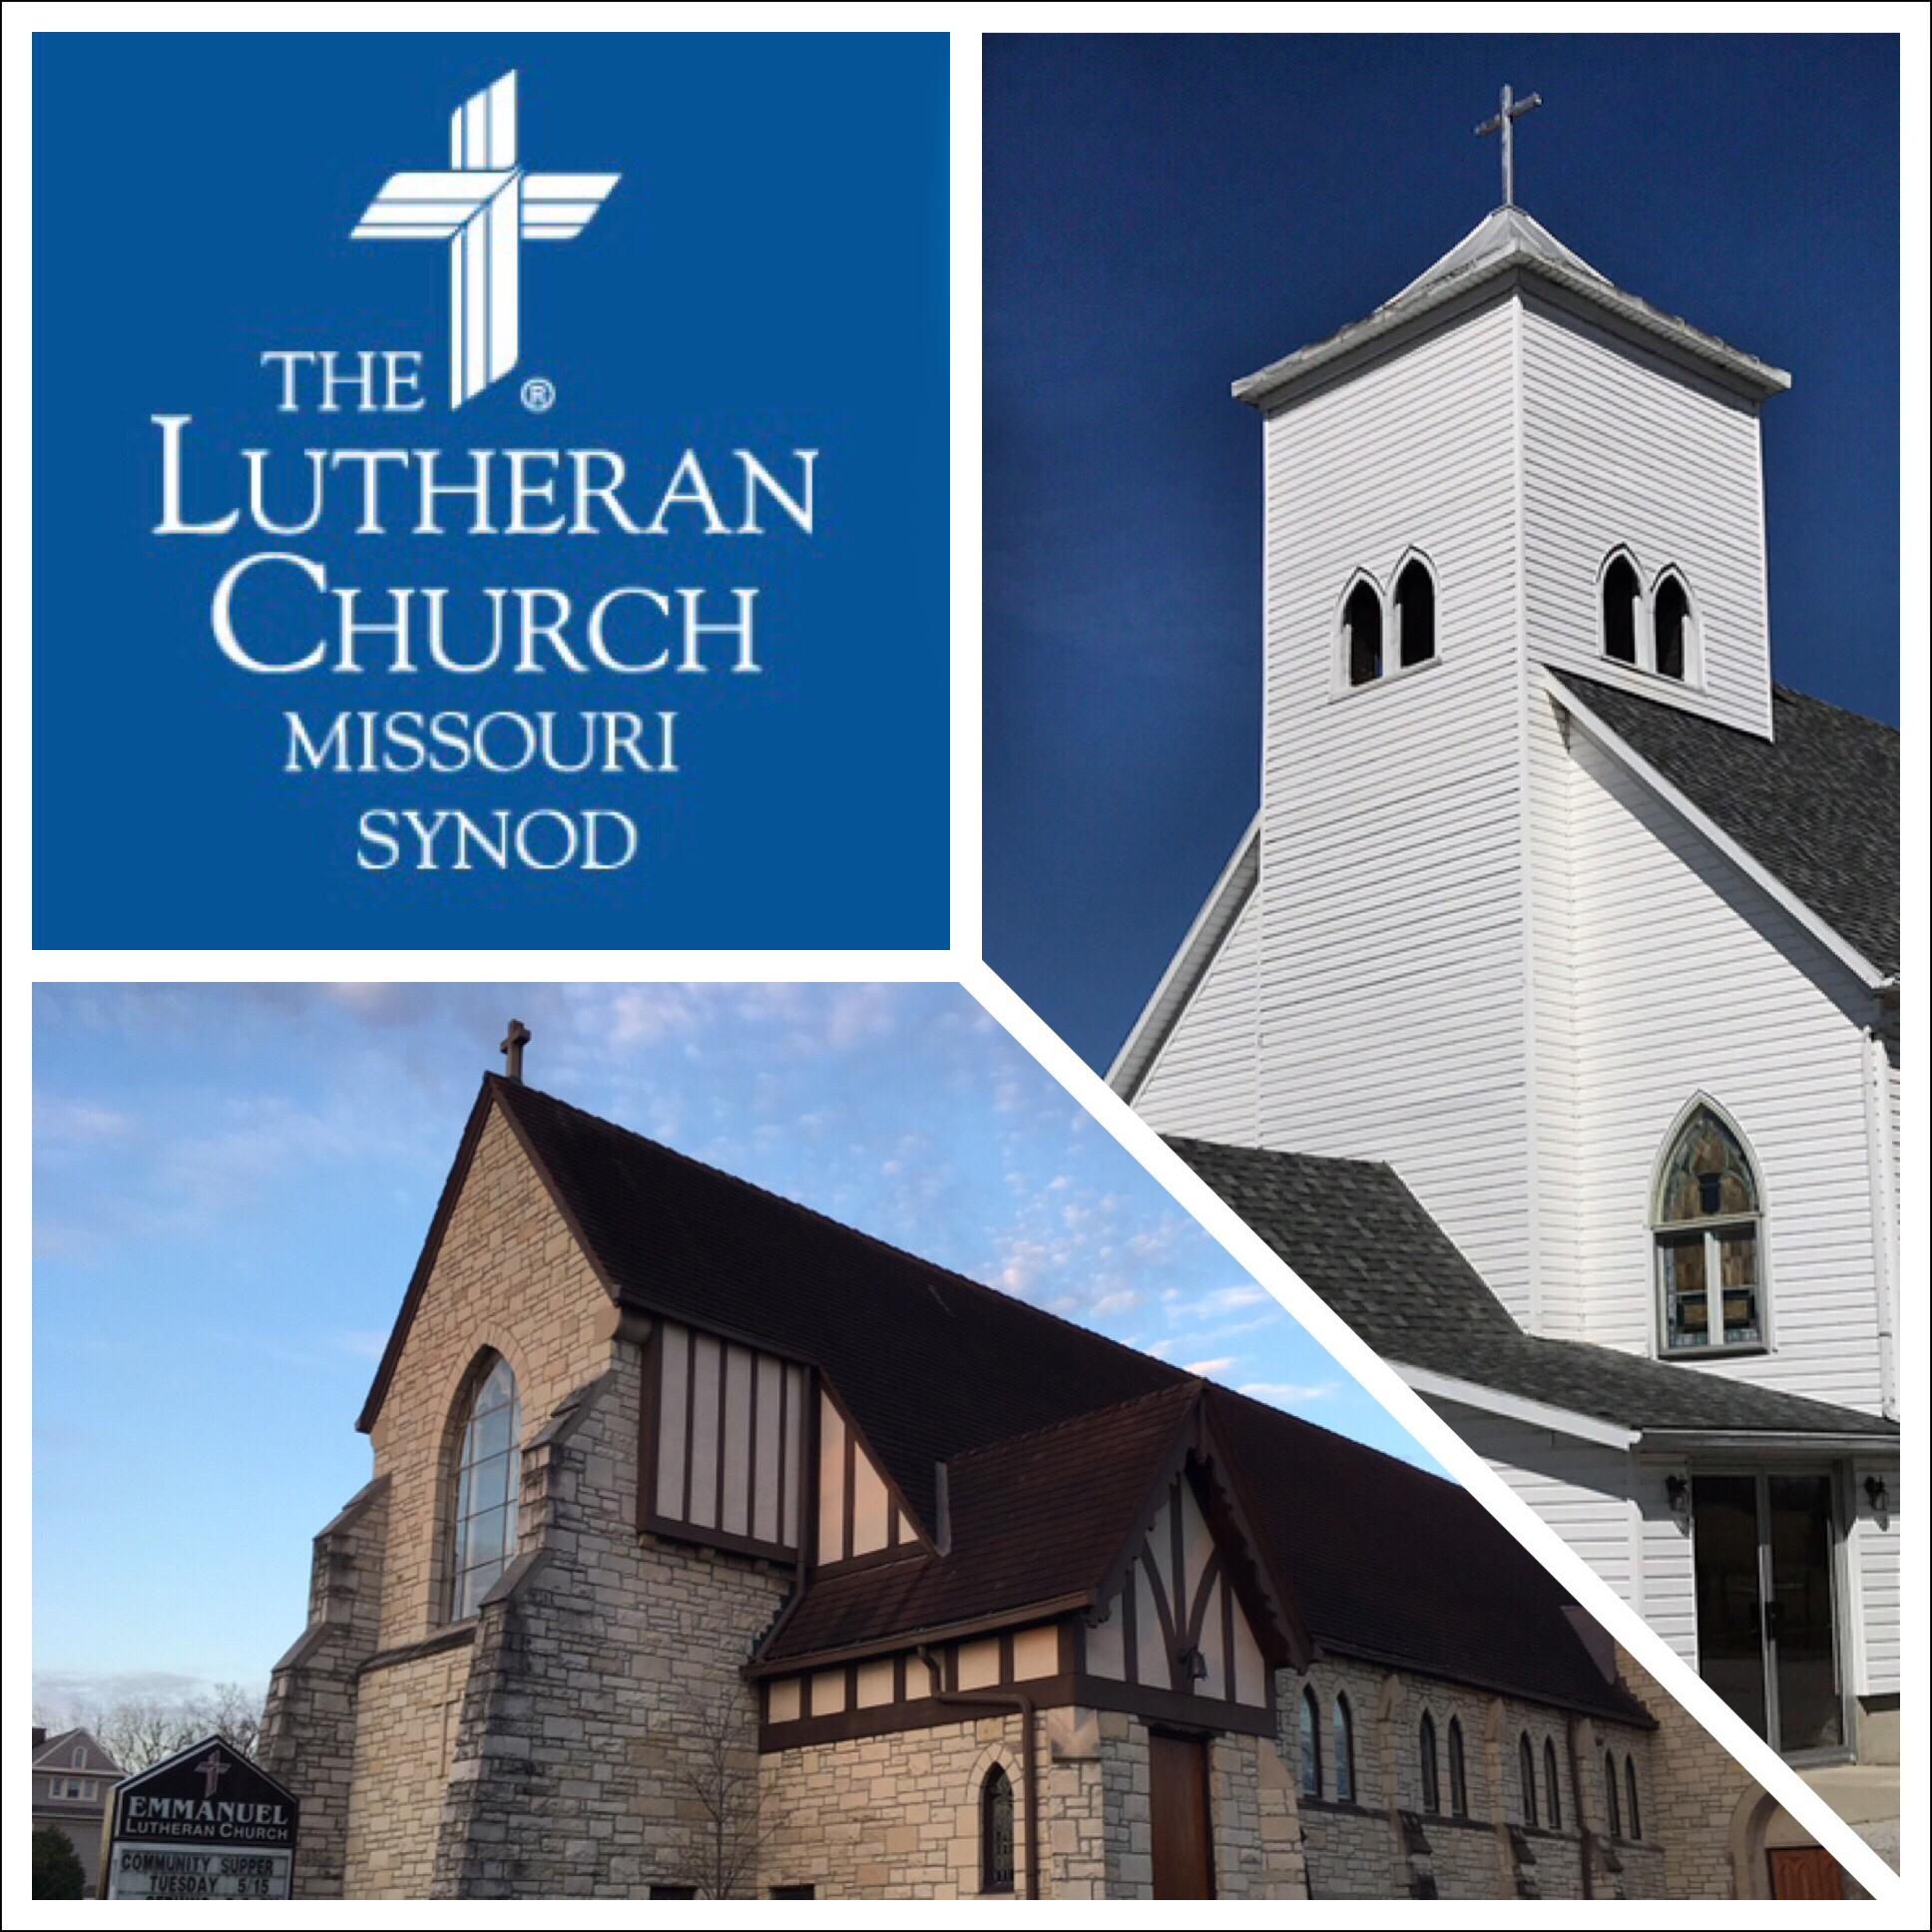 St. John's & Emmanuel Lutheran Churches